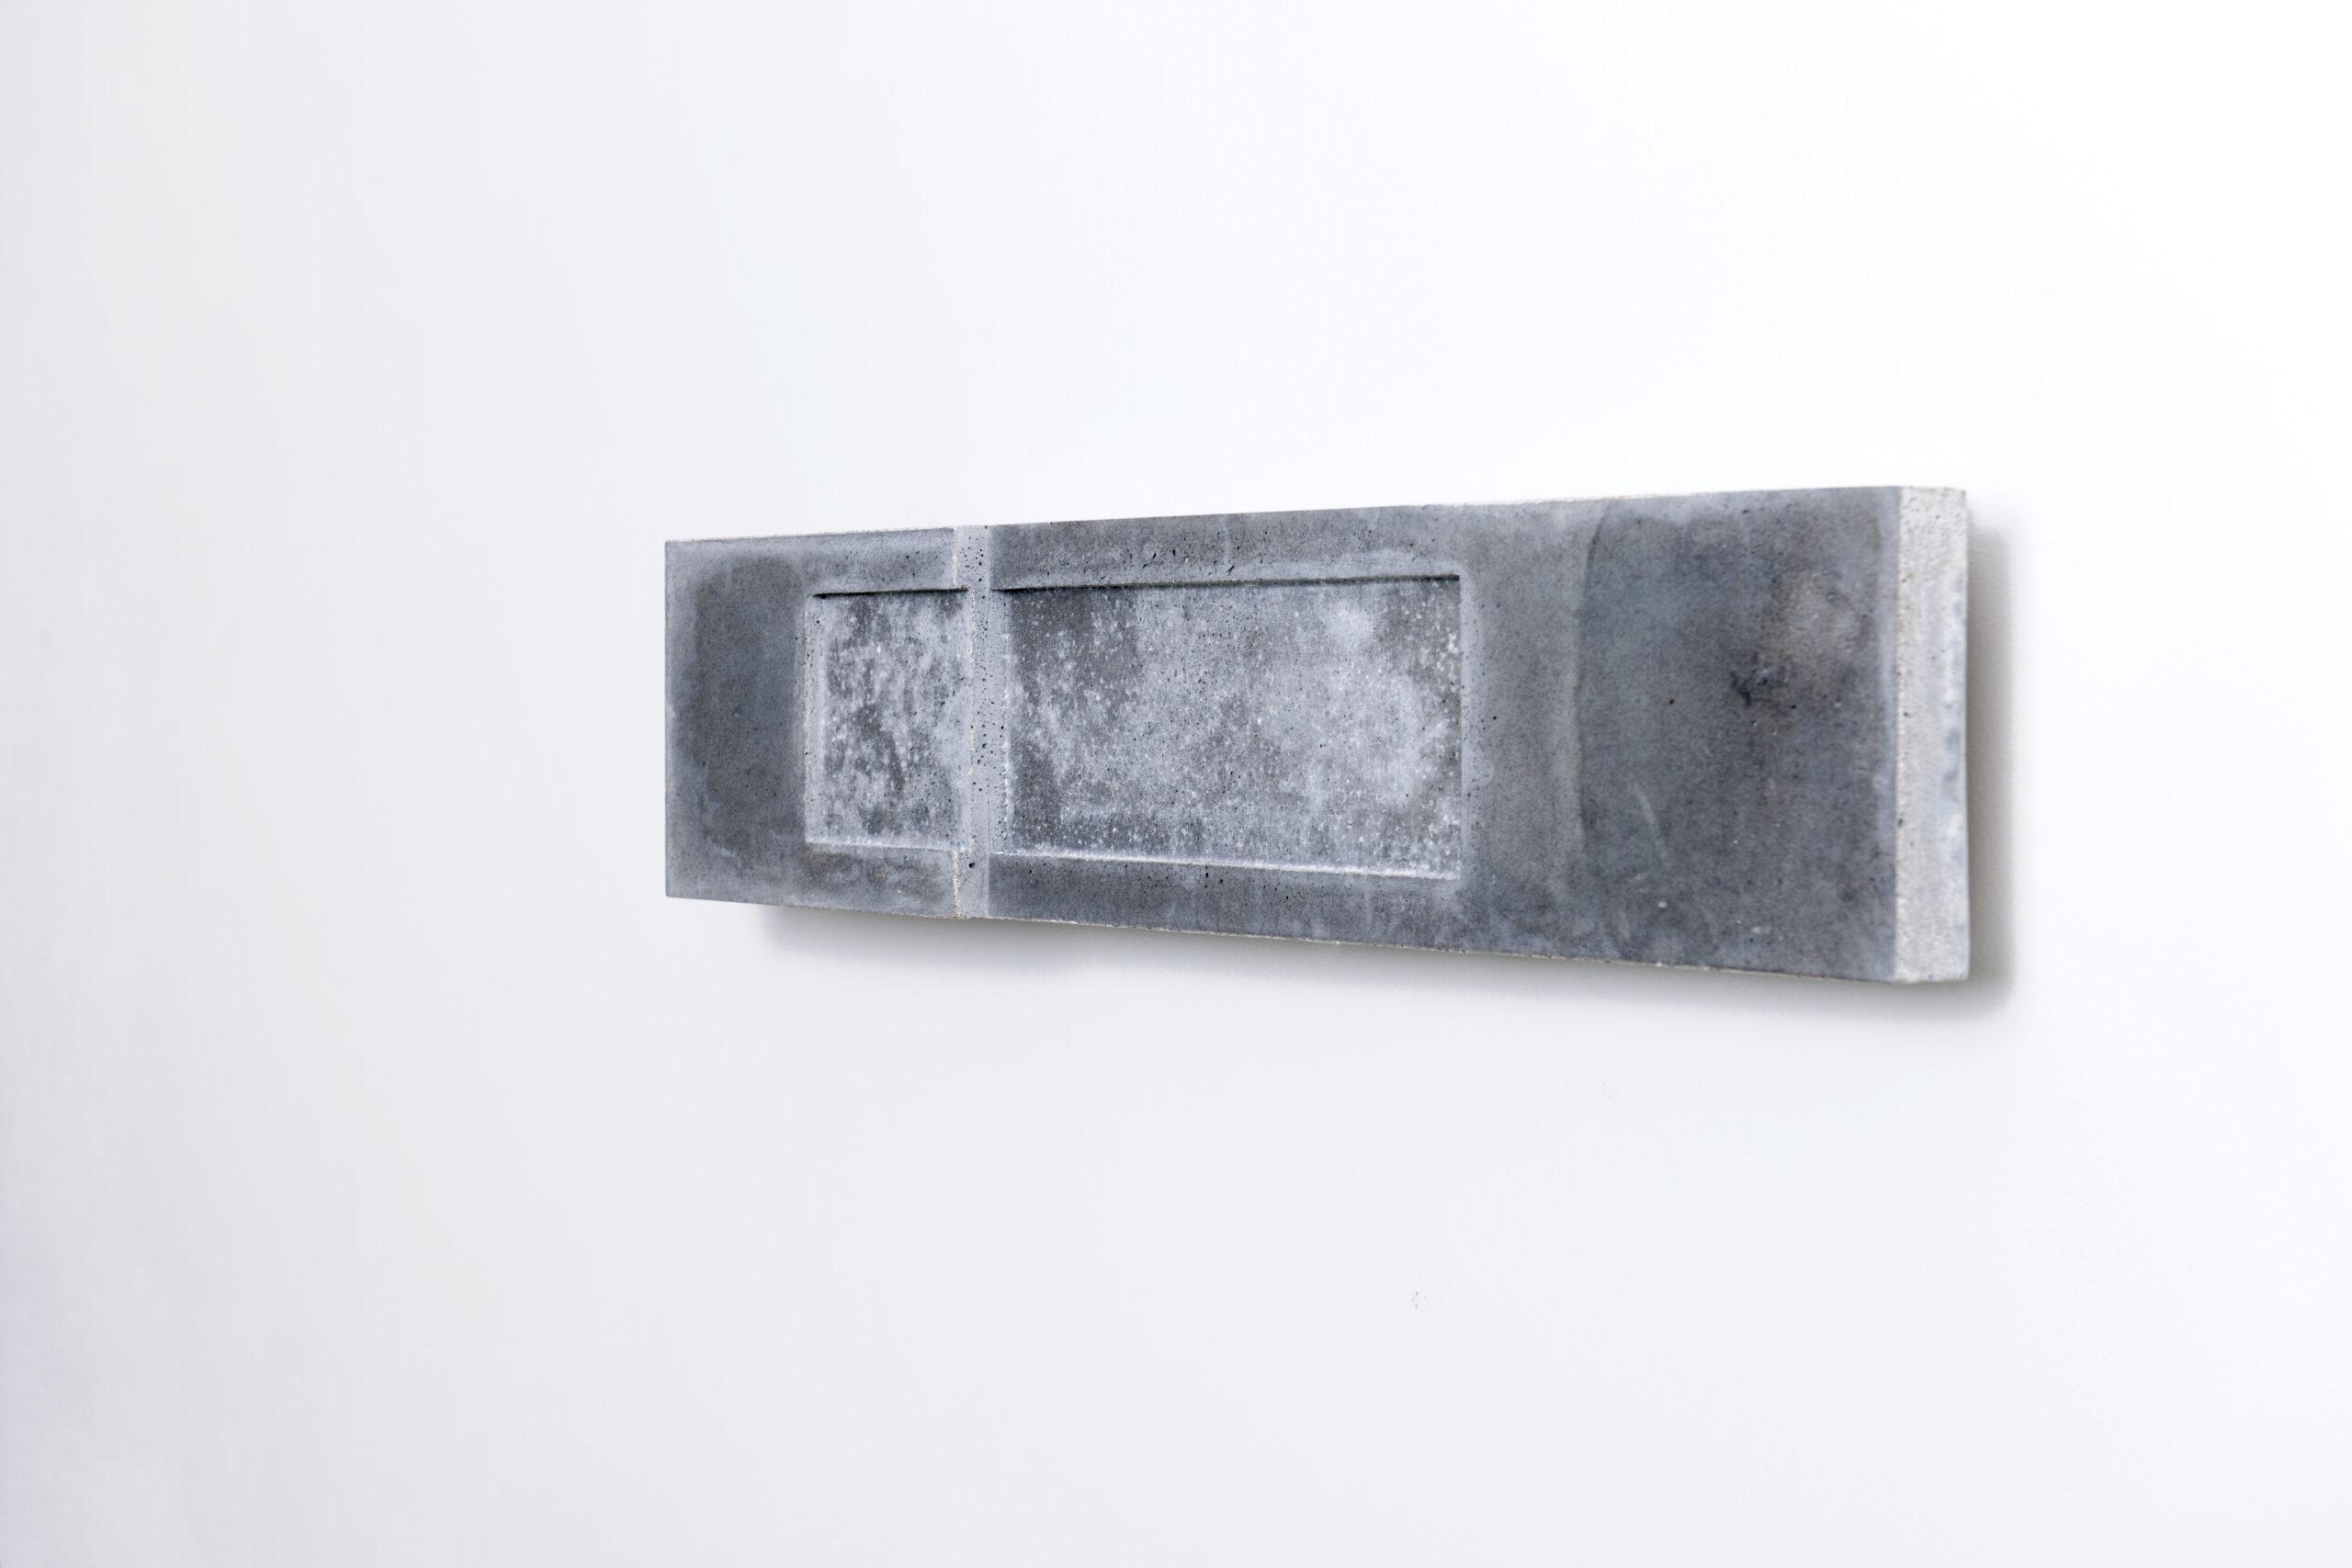 Espace III | 2016 | Beton | 80 x 18 x 9 cm